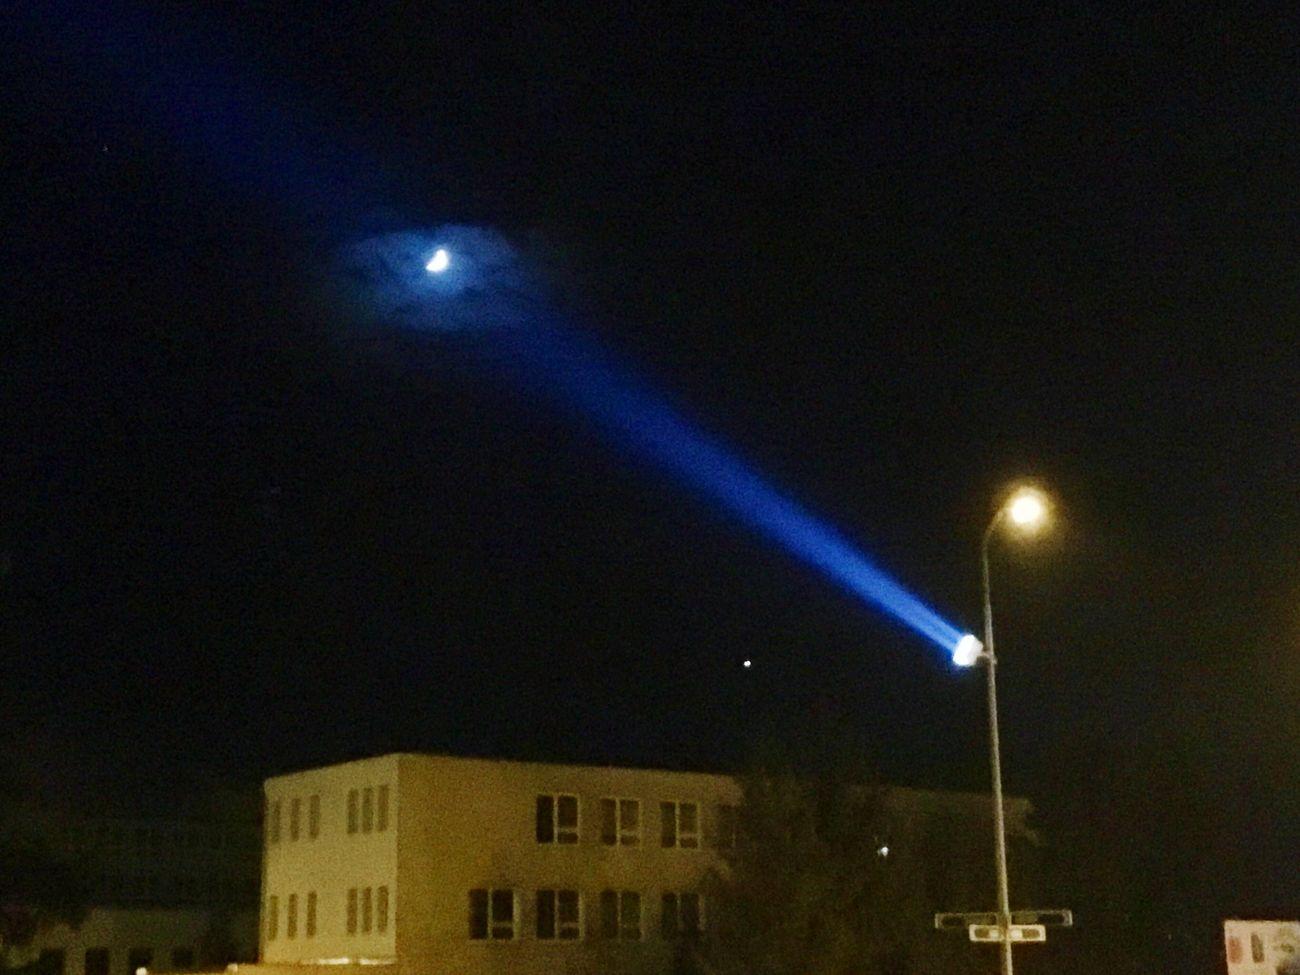 Calling Batman 😄 Night Batman First Eyeem Photo Light Moon Light And Shadow Street Photography Sky Wiew Prešov Slovakia Street Light